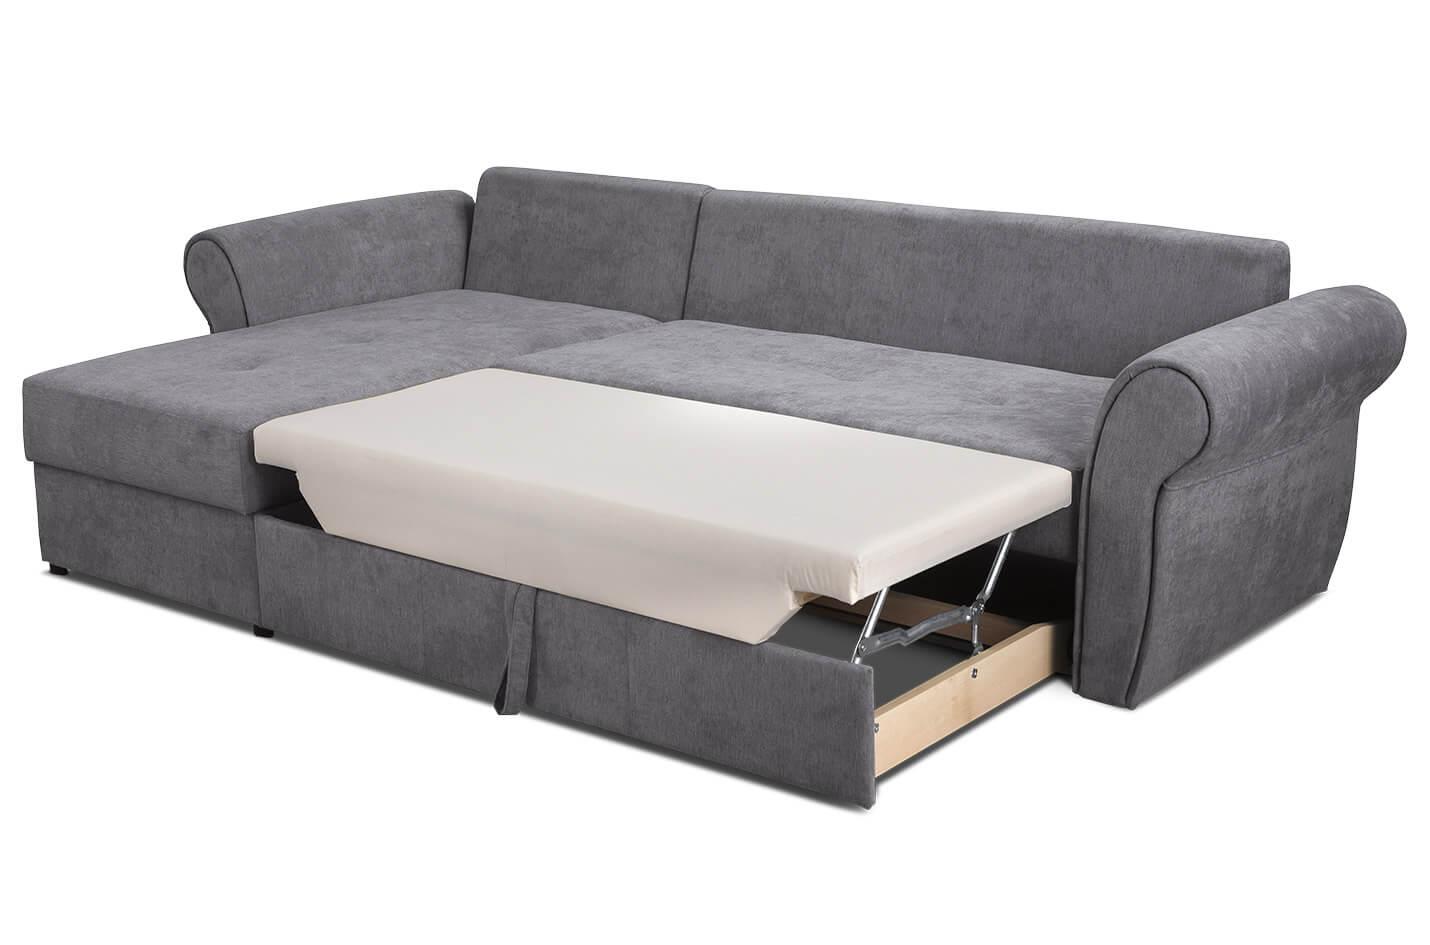 freistellen bildbearbeitung mobel sofa